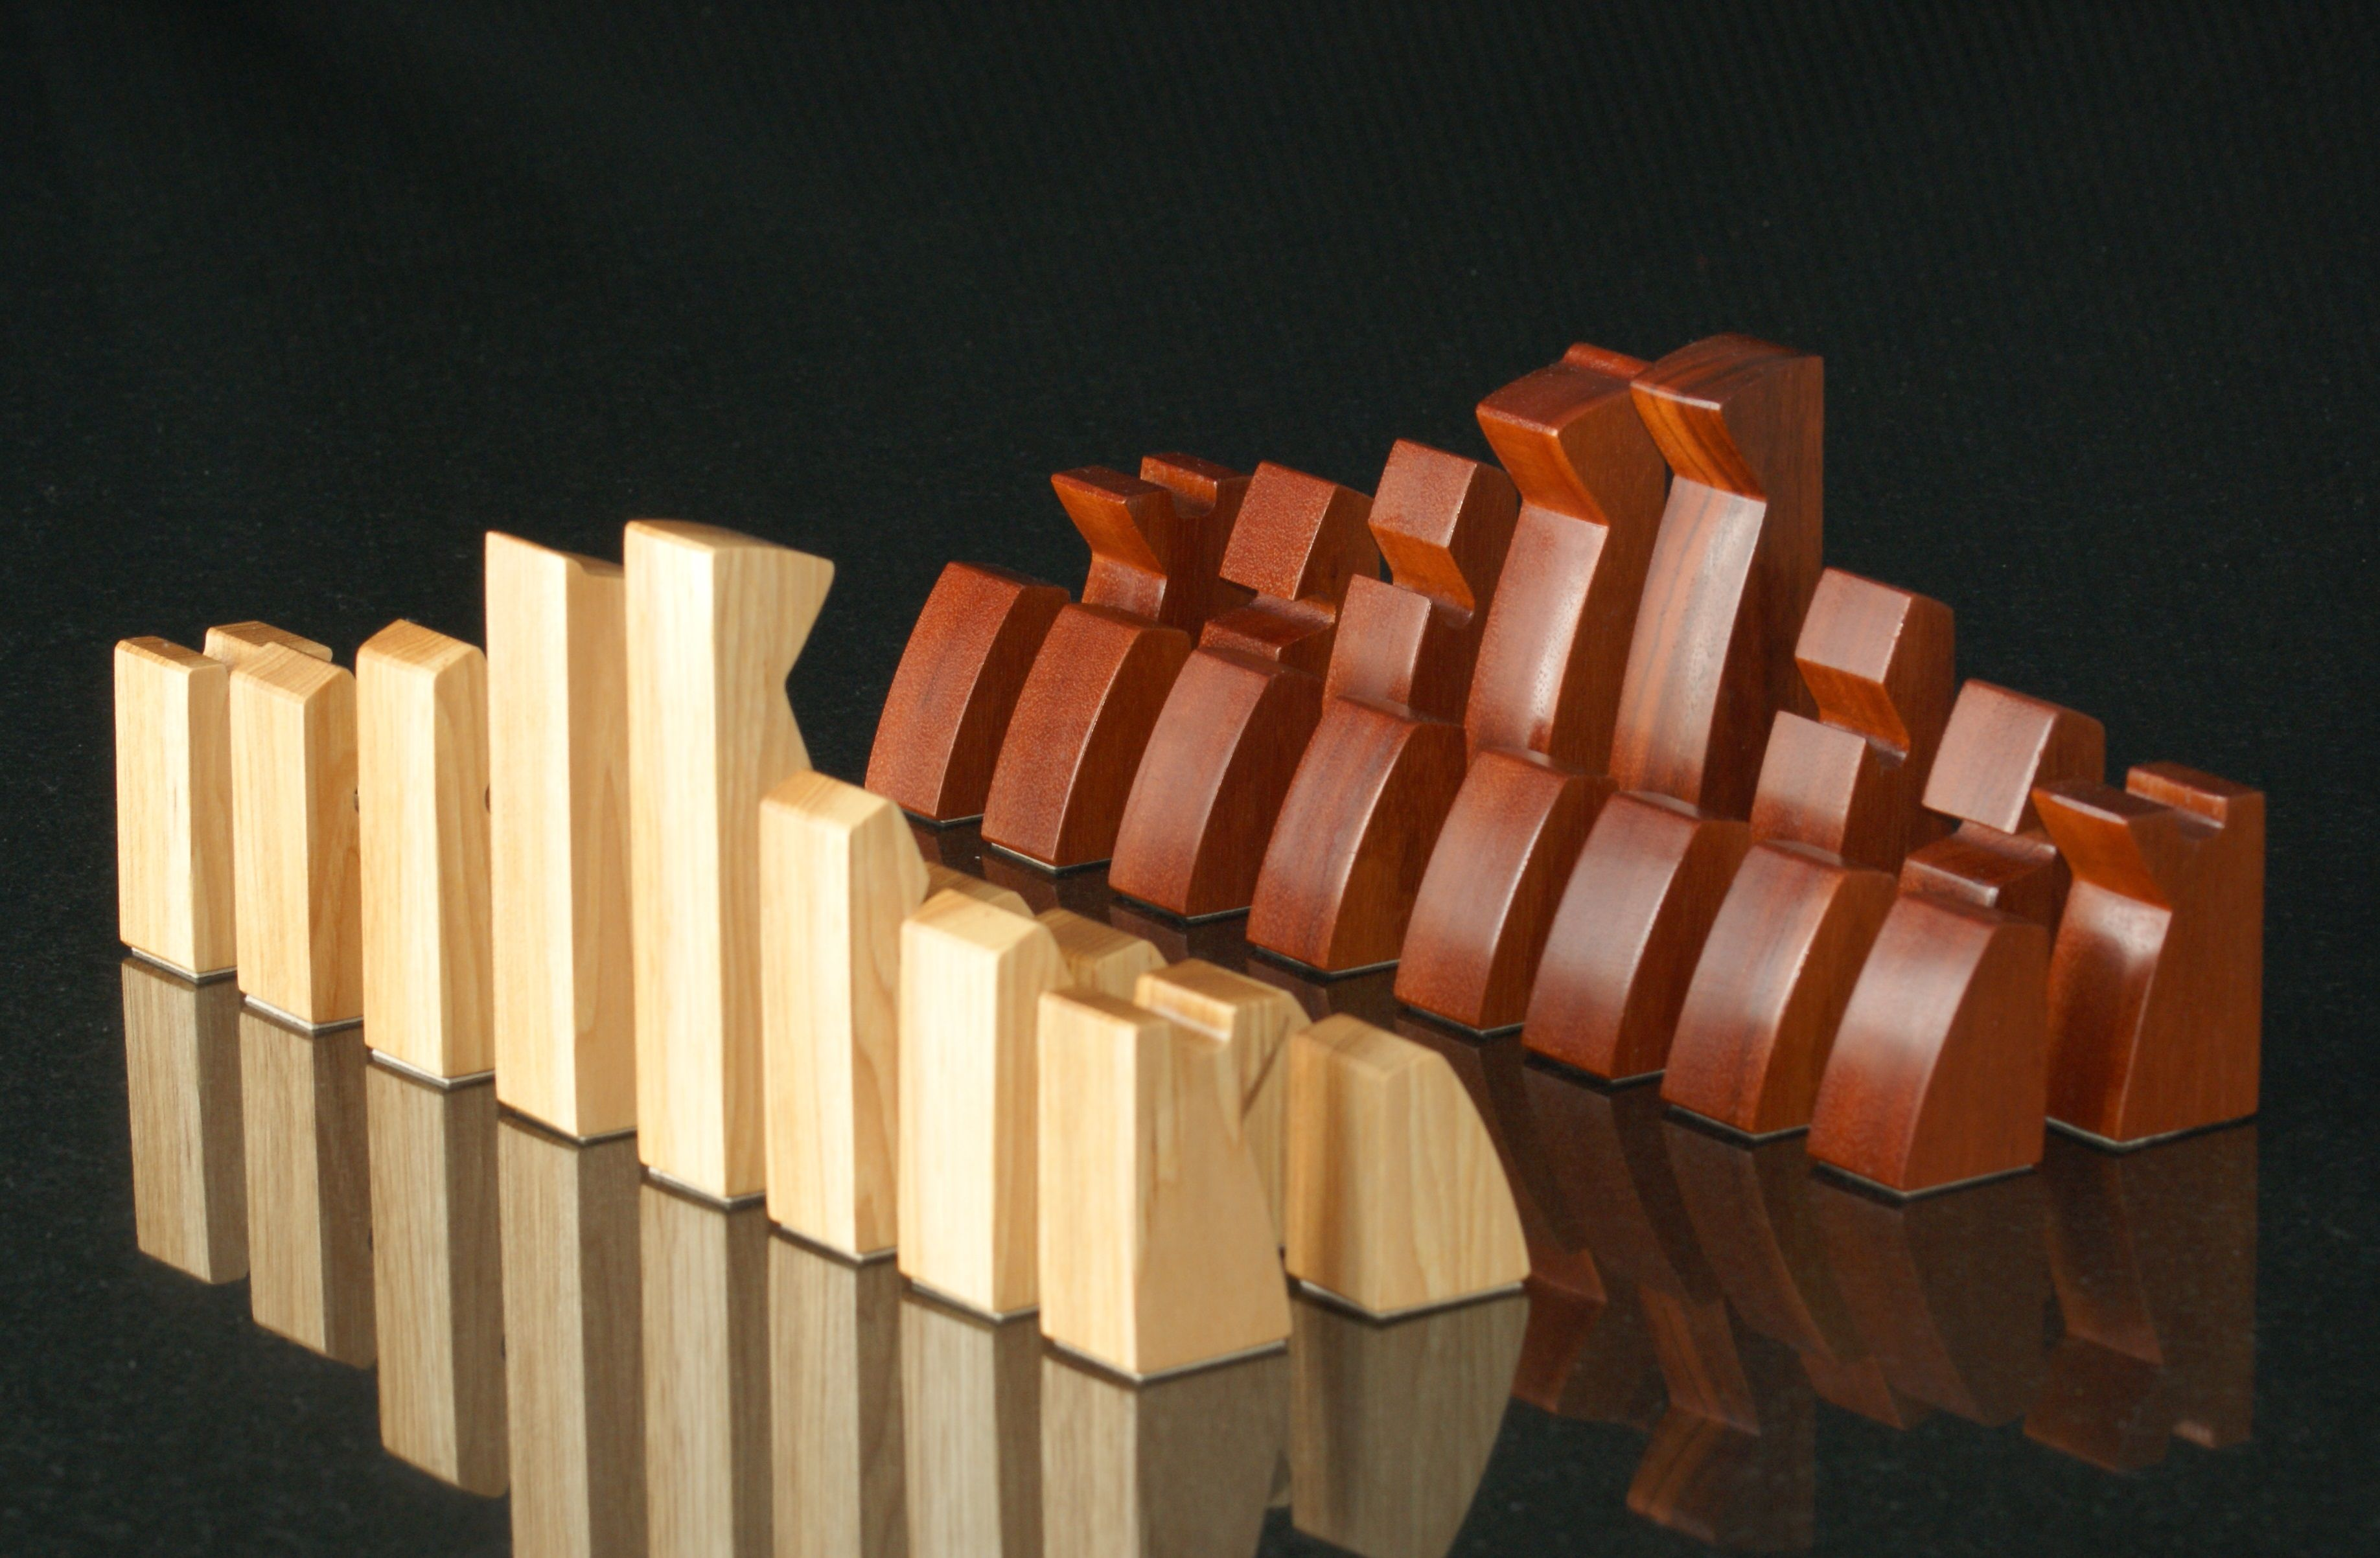 Modern Chess Set By A J Doiron Hickory Tigerwood Chess Board Modern Chess Set Wood Chess